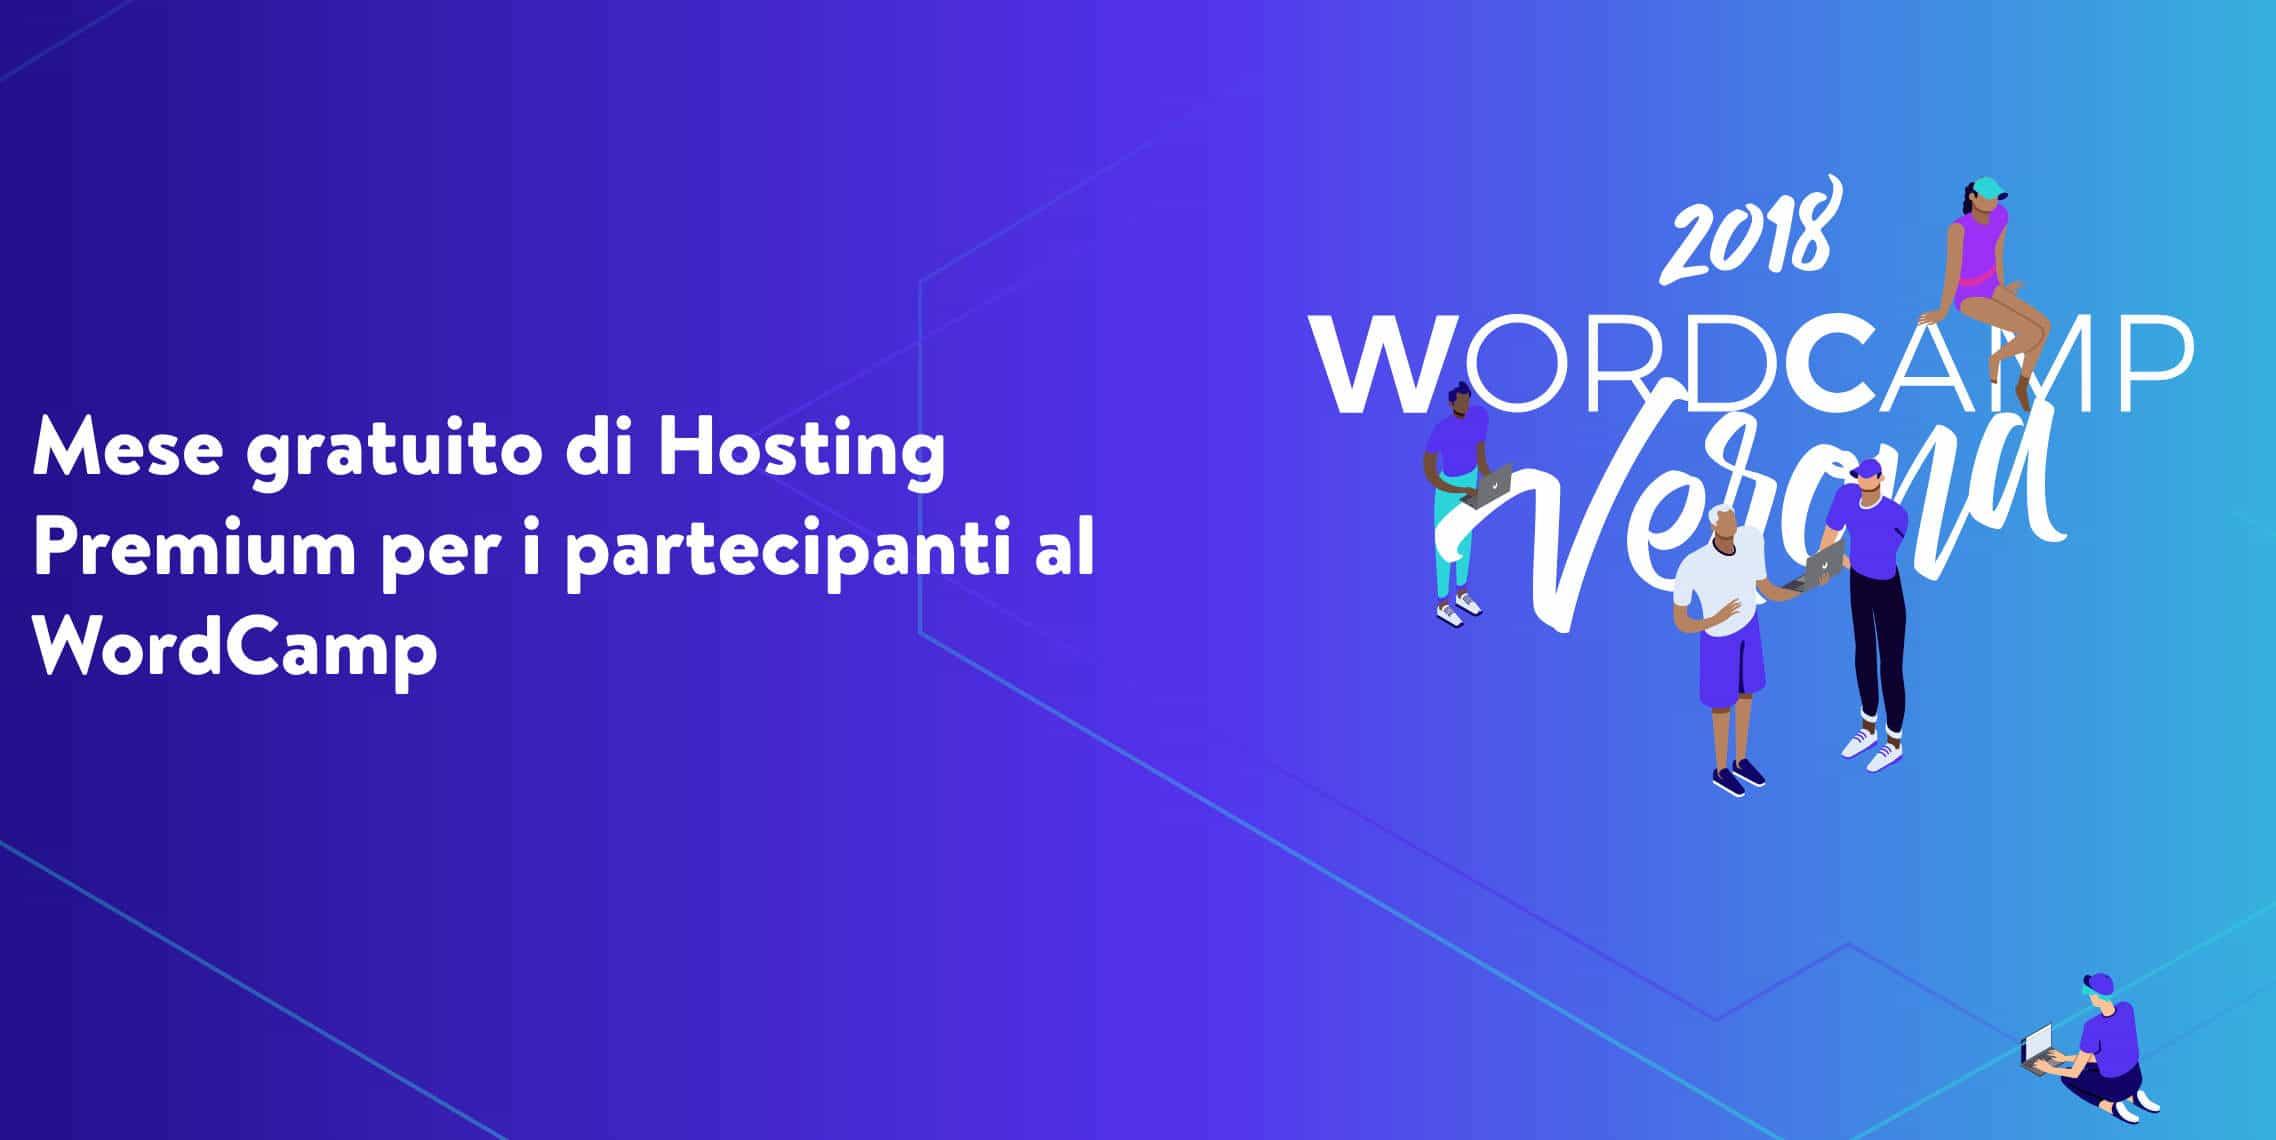 Promozione WordCamp Verona